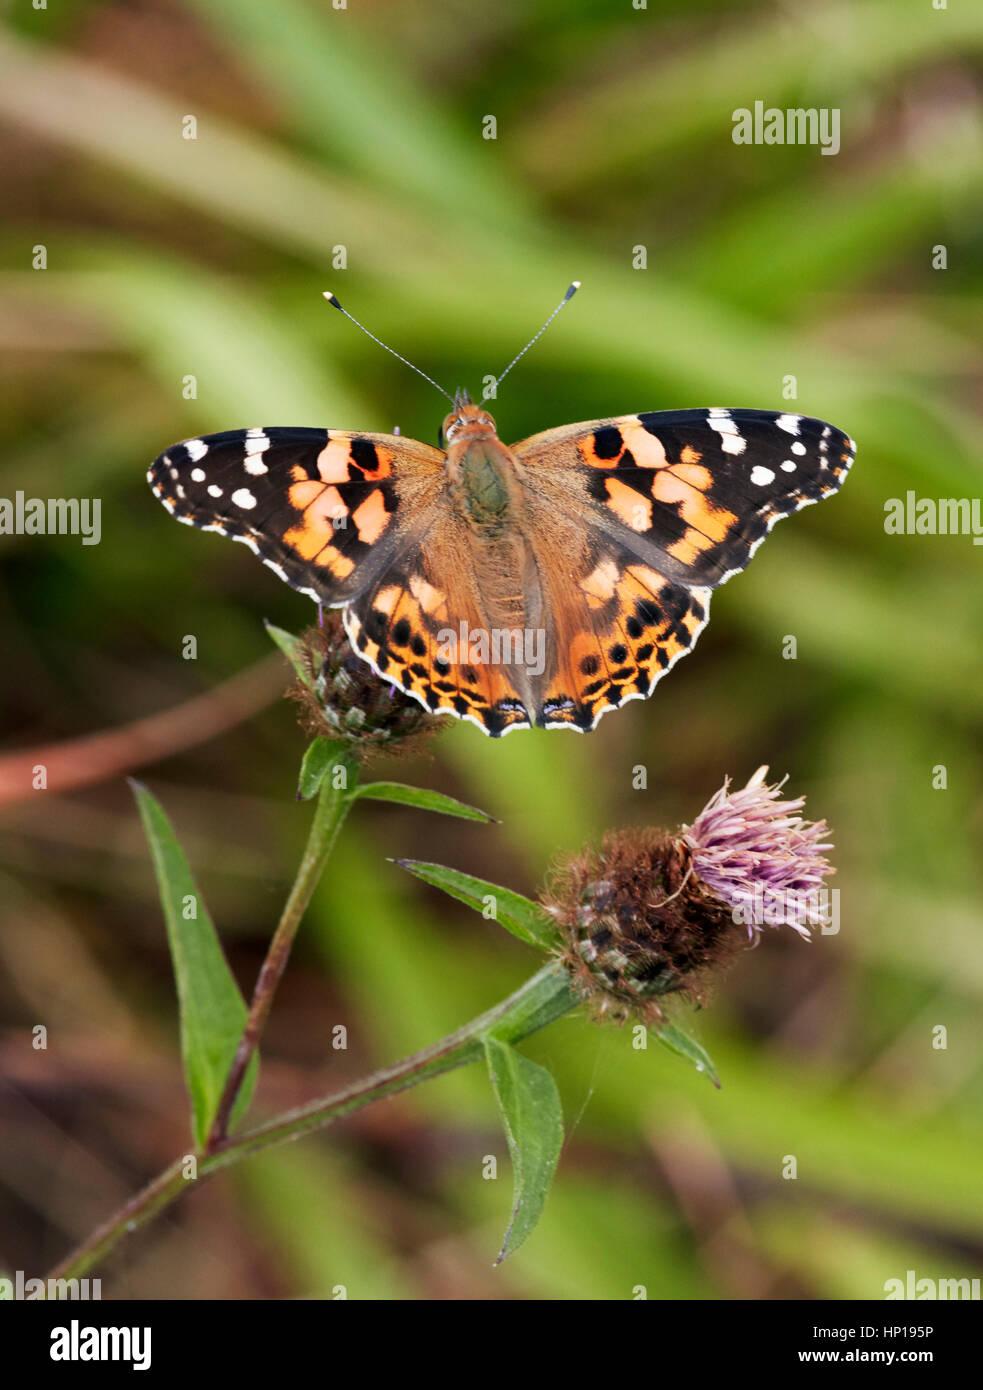 Painted Lady nectaring sobre mala hierba. hurst Park, West molesey, Surrey, Reino Unido. Imagen De Stock